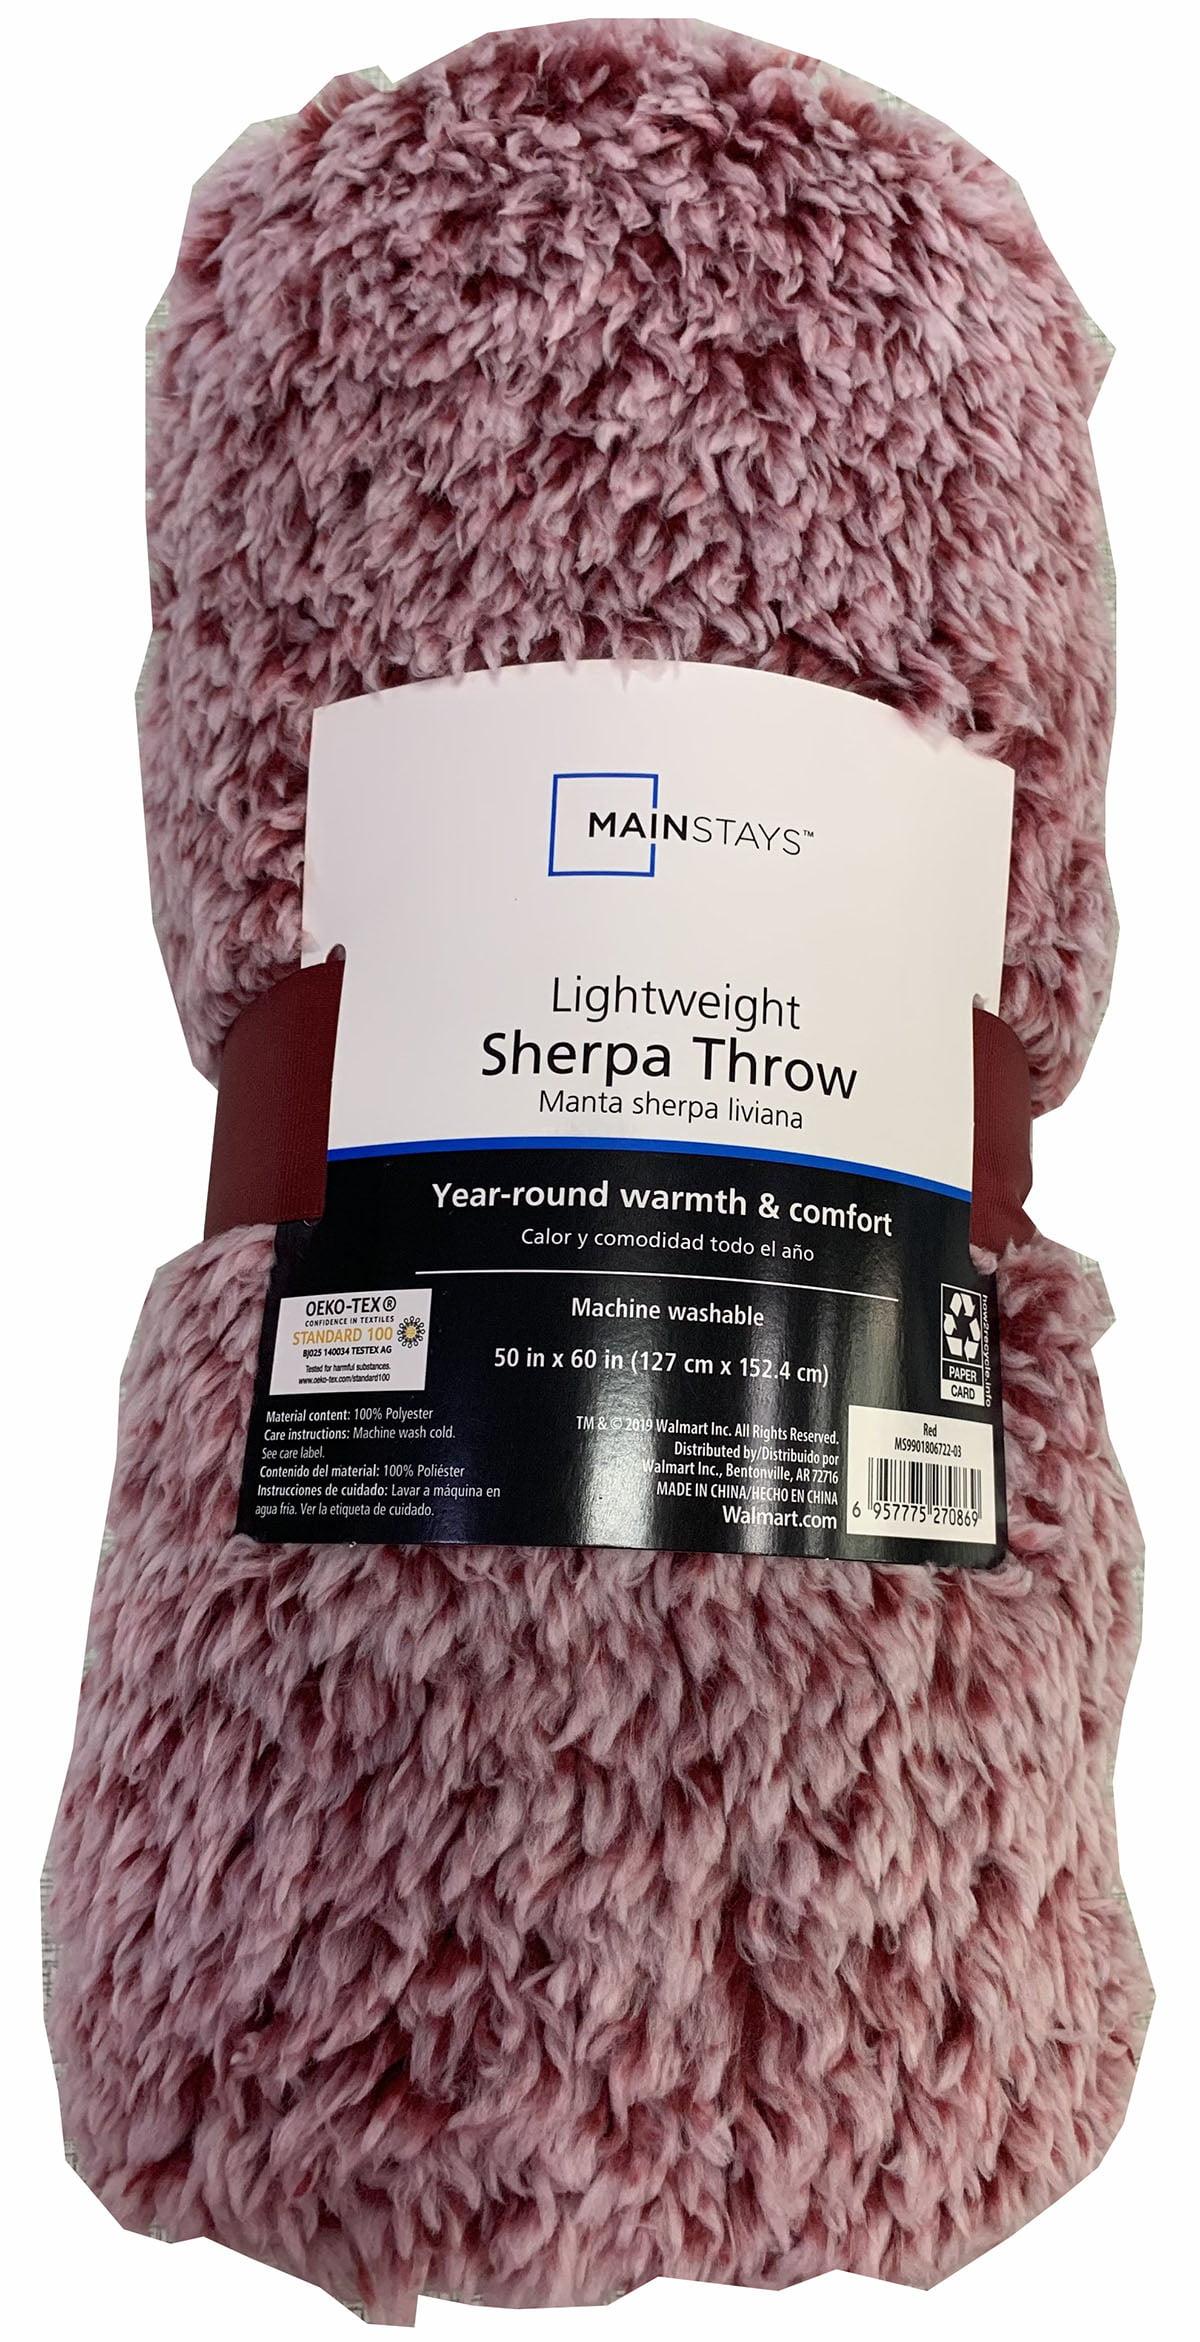 Mainstays Extra Plush Lightweight Sherpa Throw Blanket 50 X 60 Gray Walmart Com Walmart Com